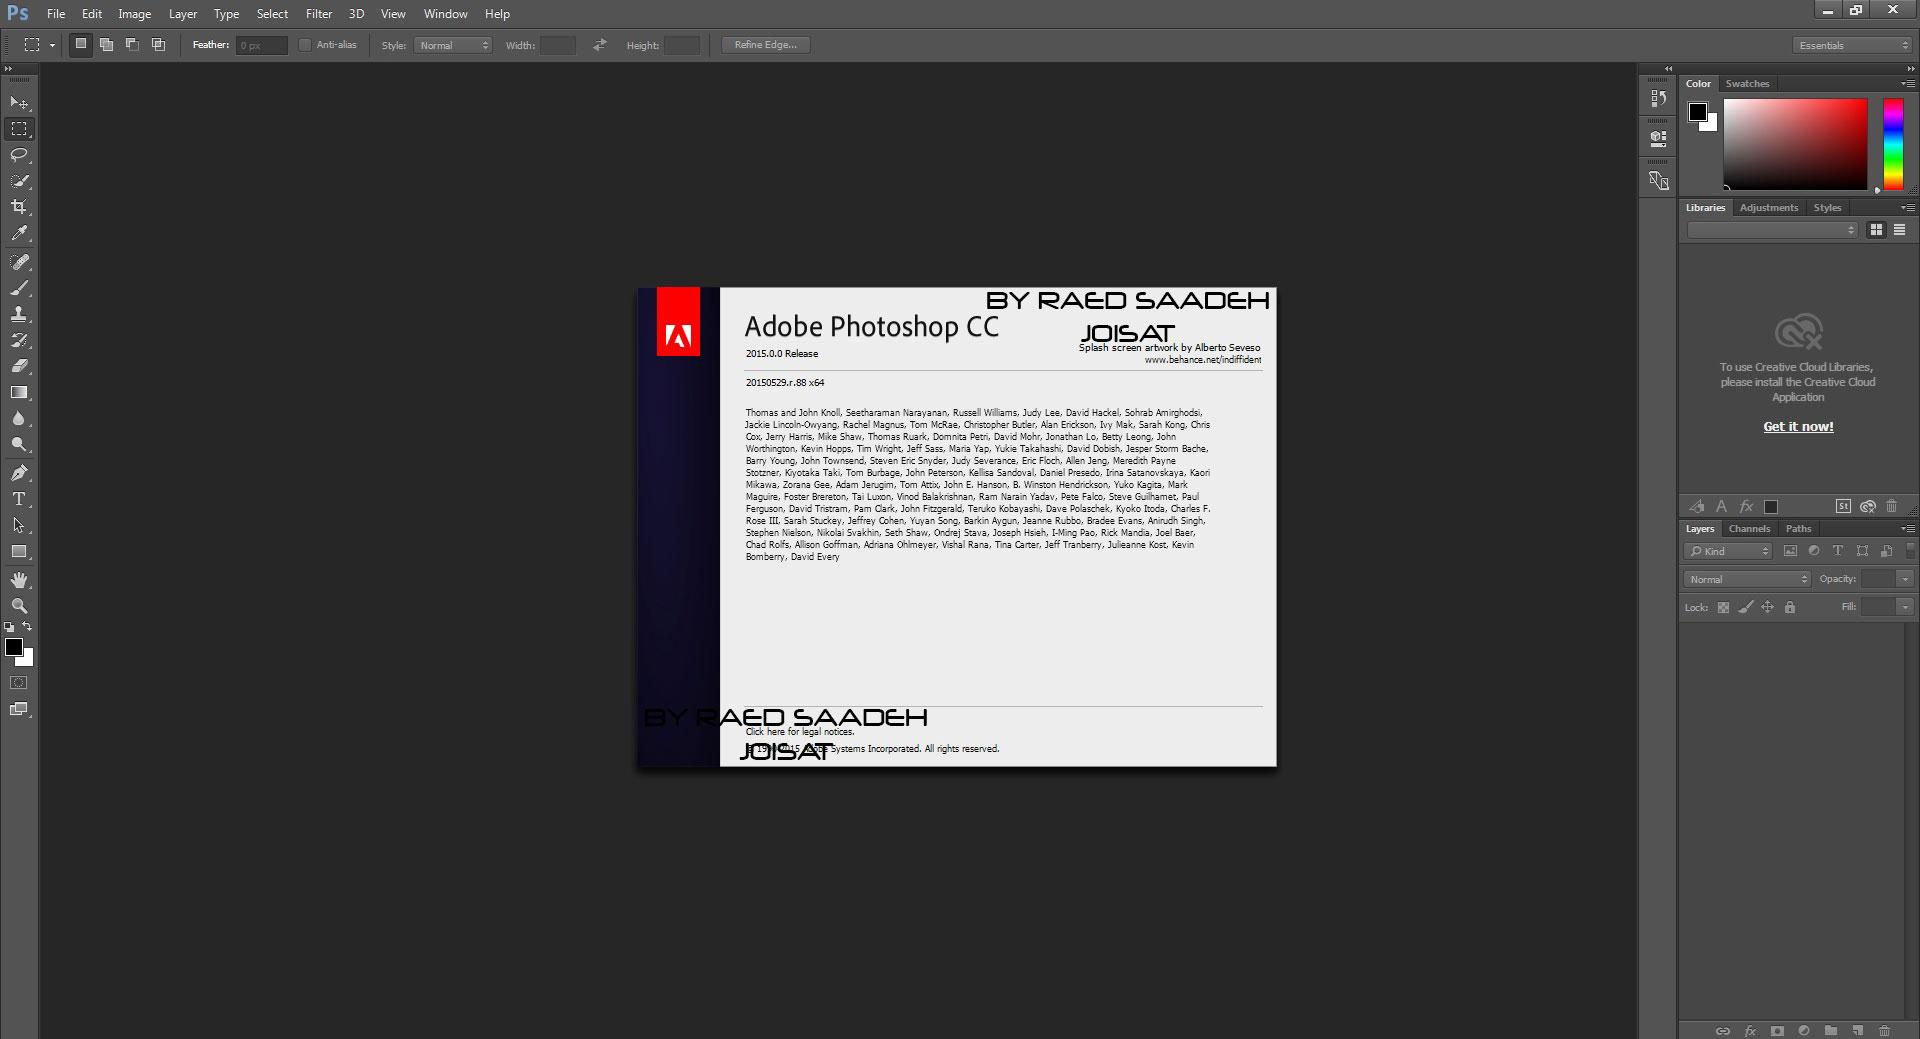 Adobe Photoshop ������ �����